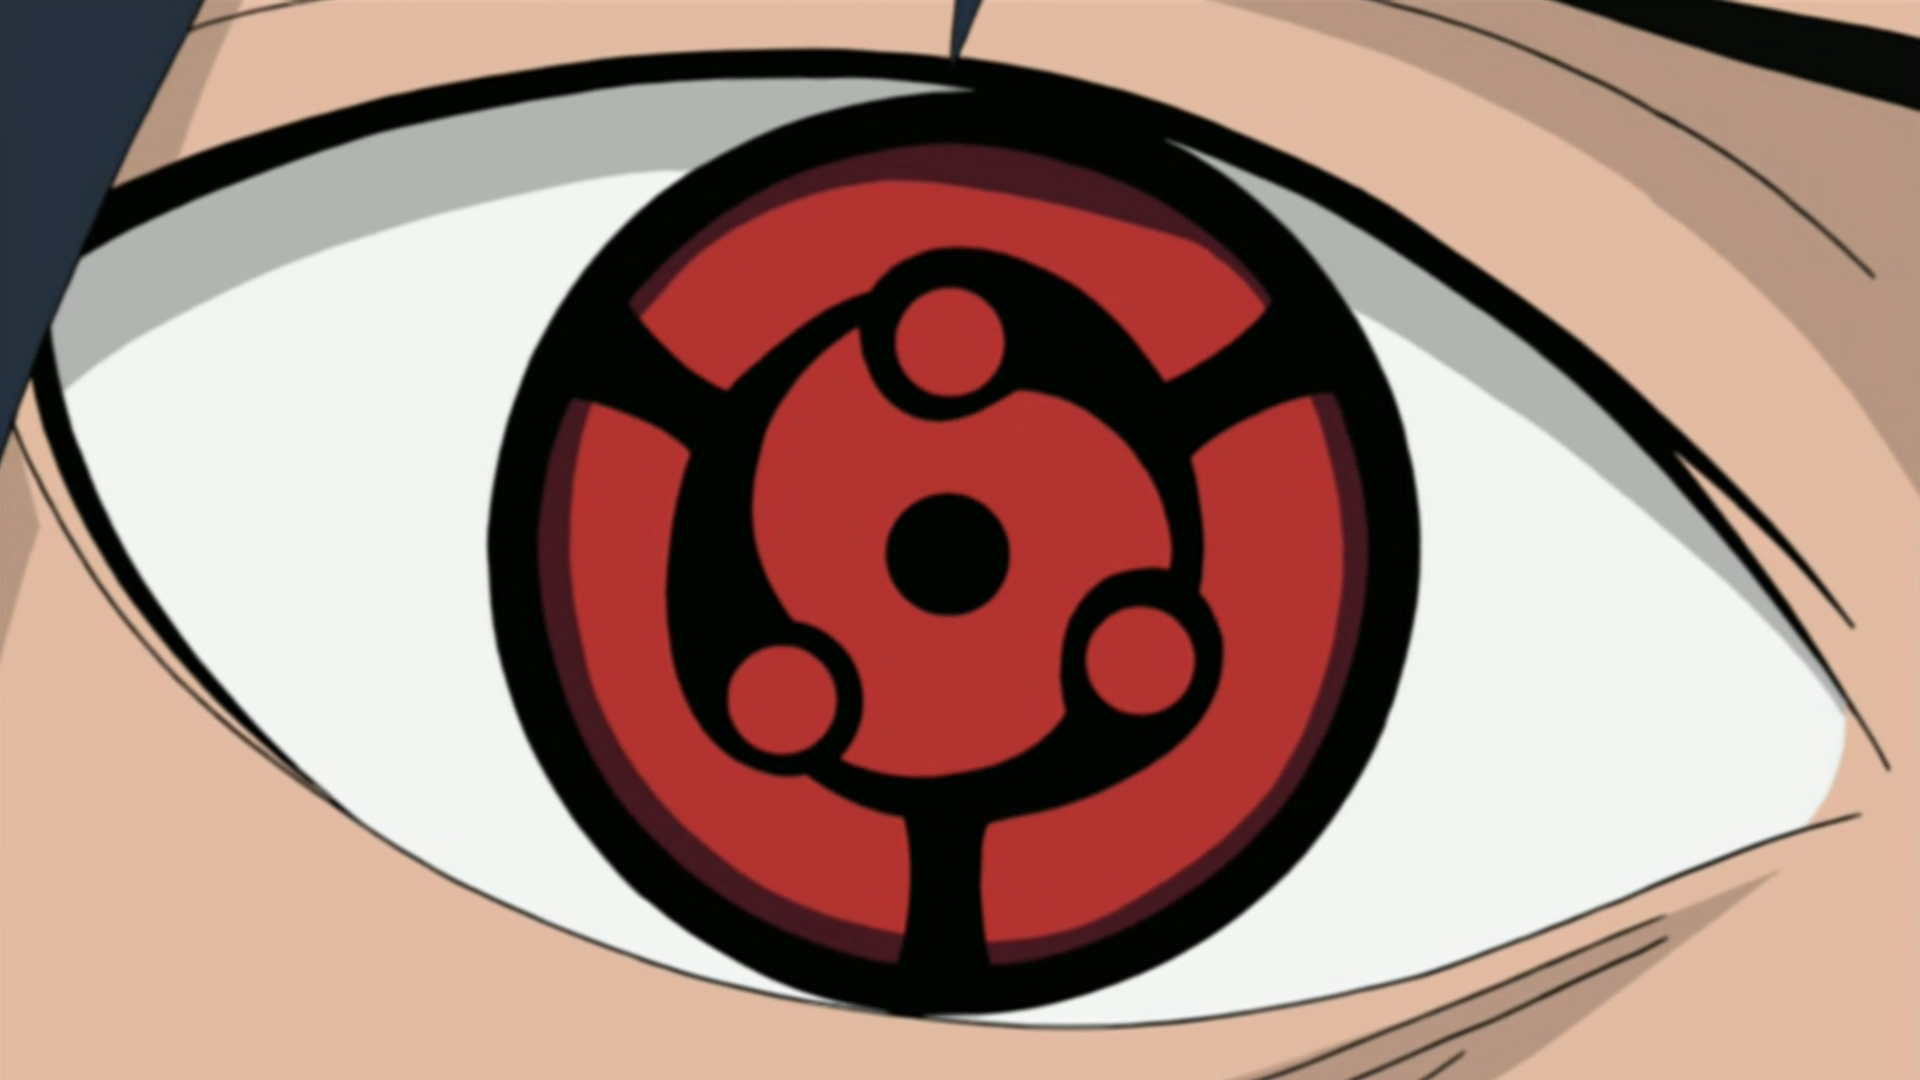 Madara Uchiha - Narutopedia, the Naruto Encyclopedia Wiki